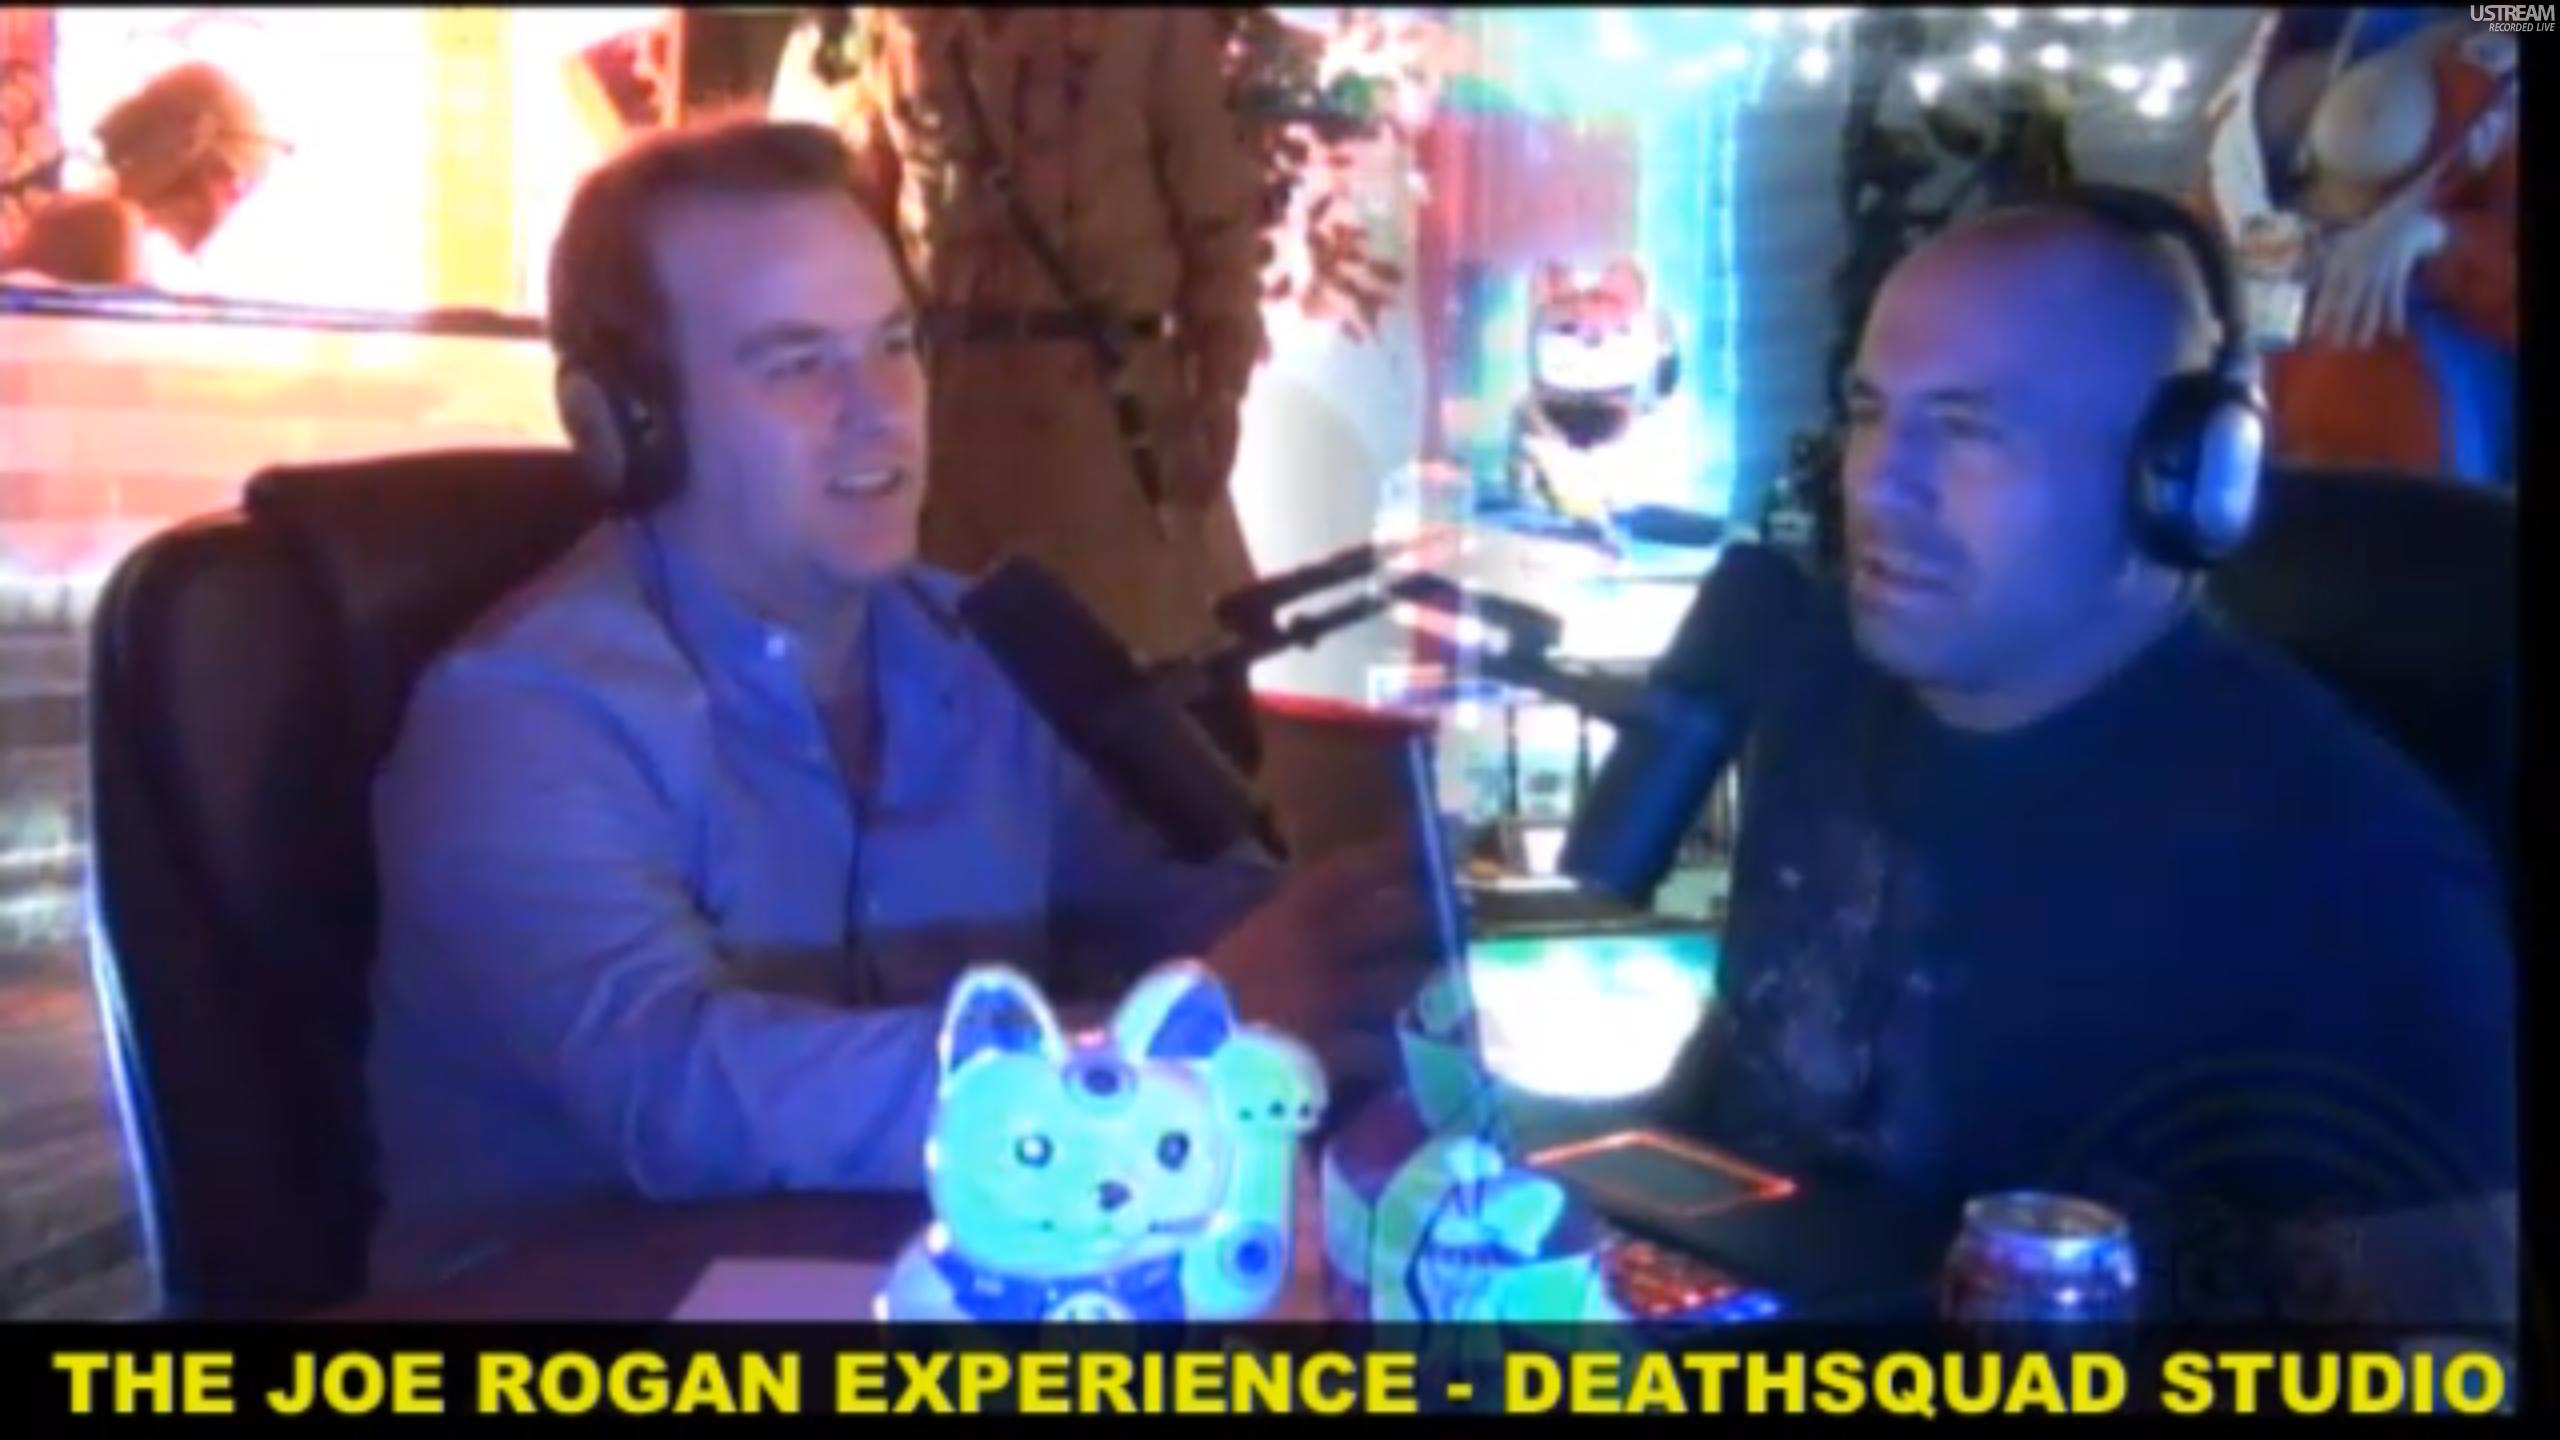 The Joe Rogan Experience #259 - Mike Birbiglia, Brian Redban